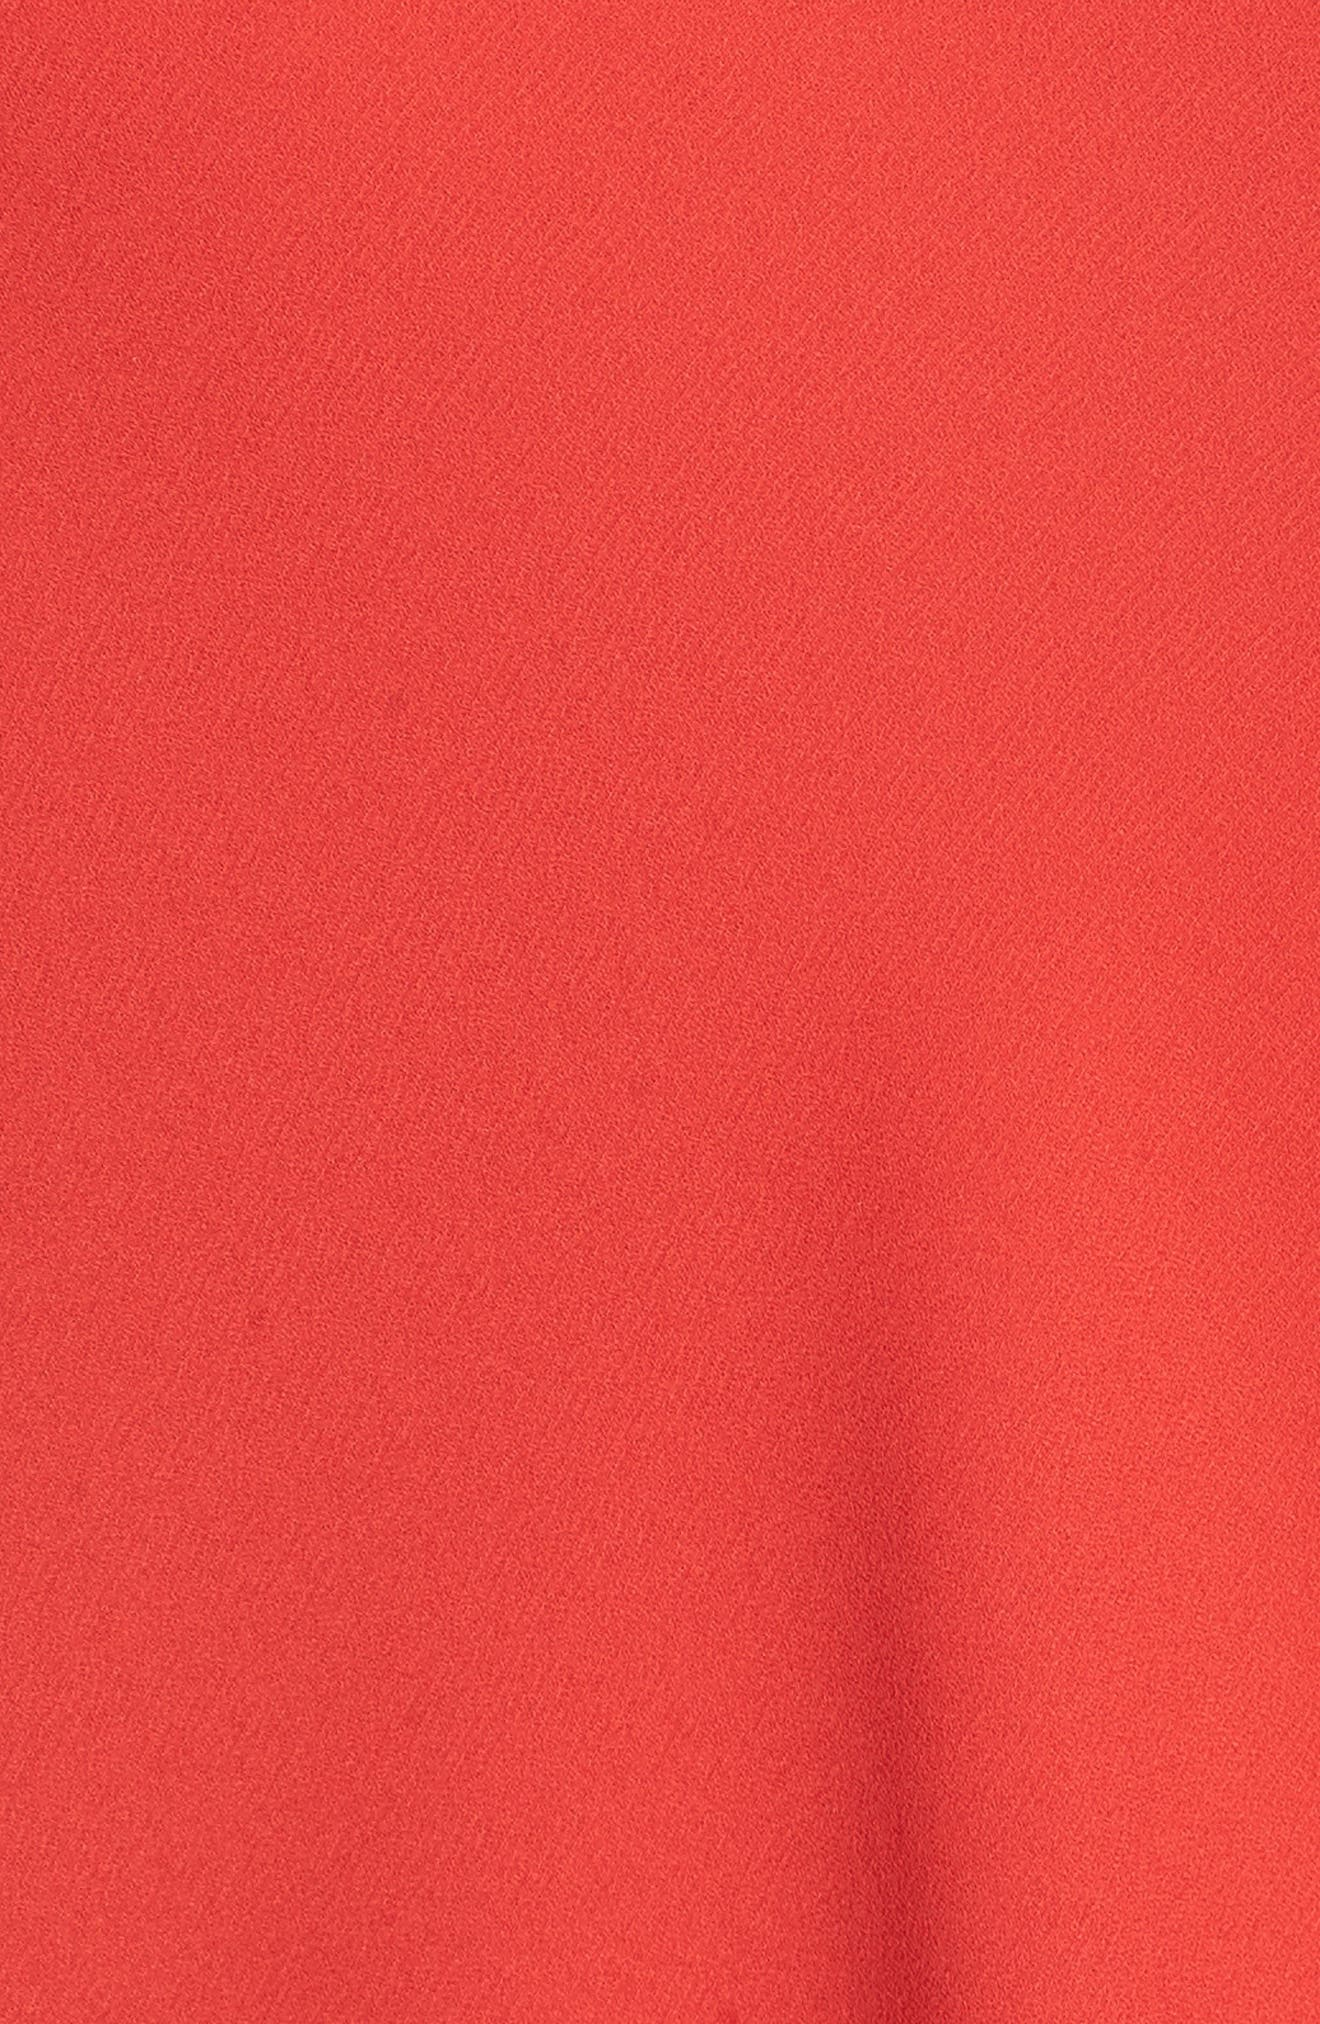 Asymmetrical Sleeveless Top,                             Alternate thumbnail 5, color,                             Red Mars